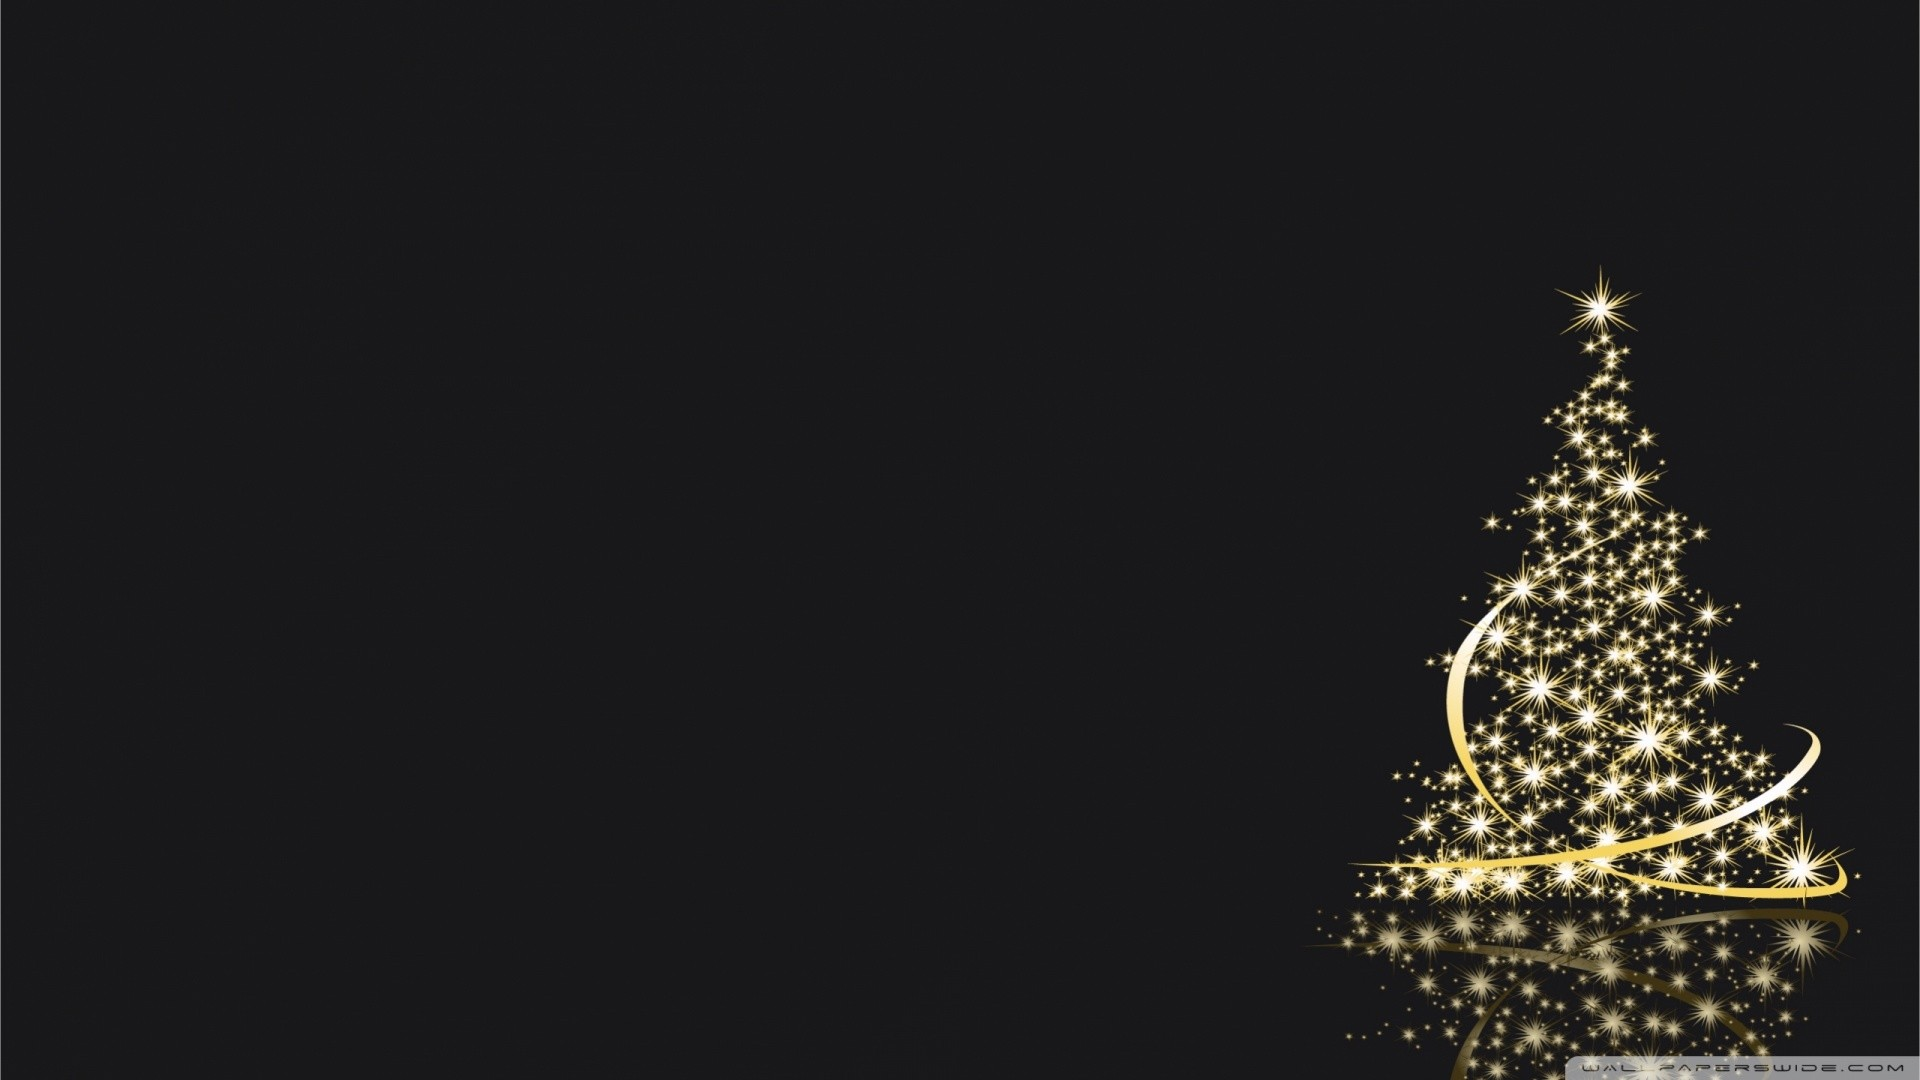 1920x1080 top 12 christmas tree wallpaper and desktop backgrounds 9757 - Desktop Christmas Tree